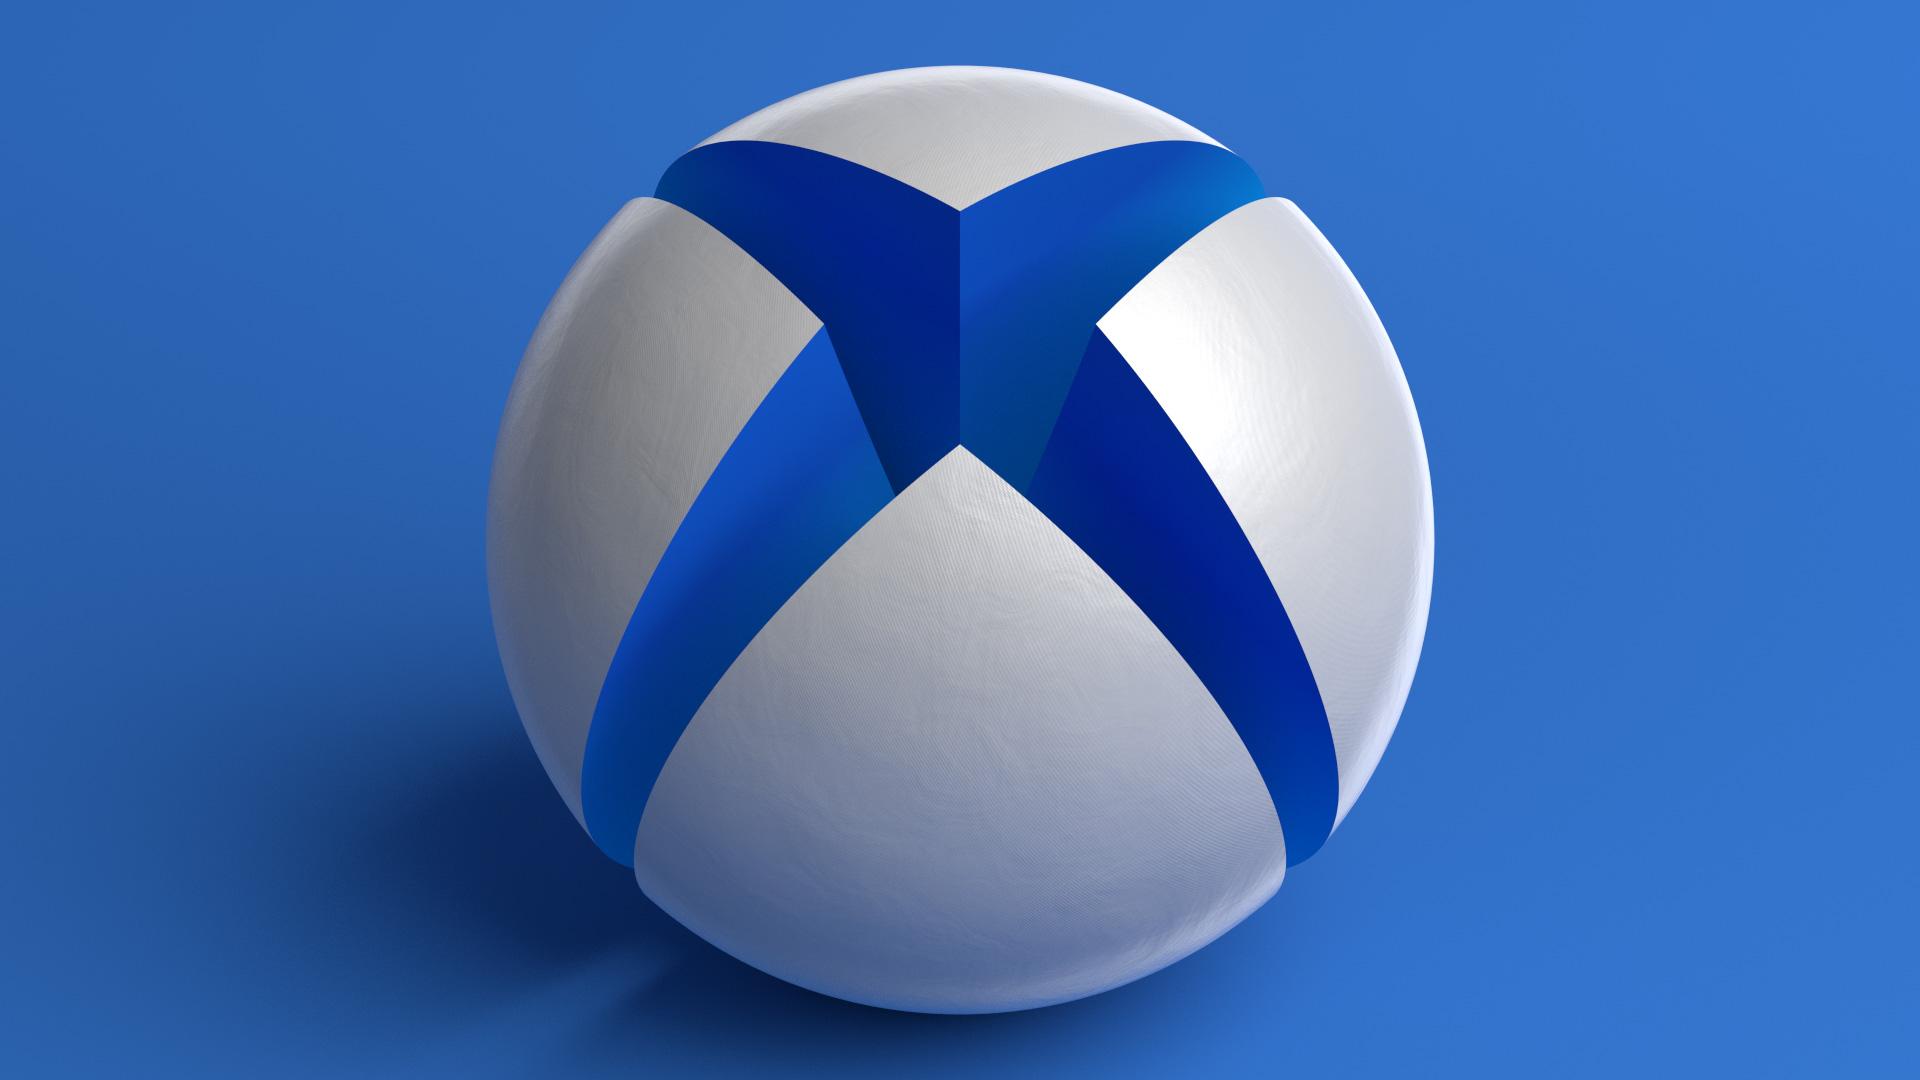 Neon Wallpaper Hd 3d X1bg Giant Xbox Sphere Blue Martin Crownover